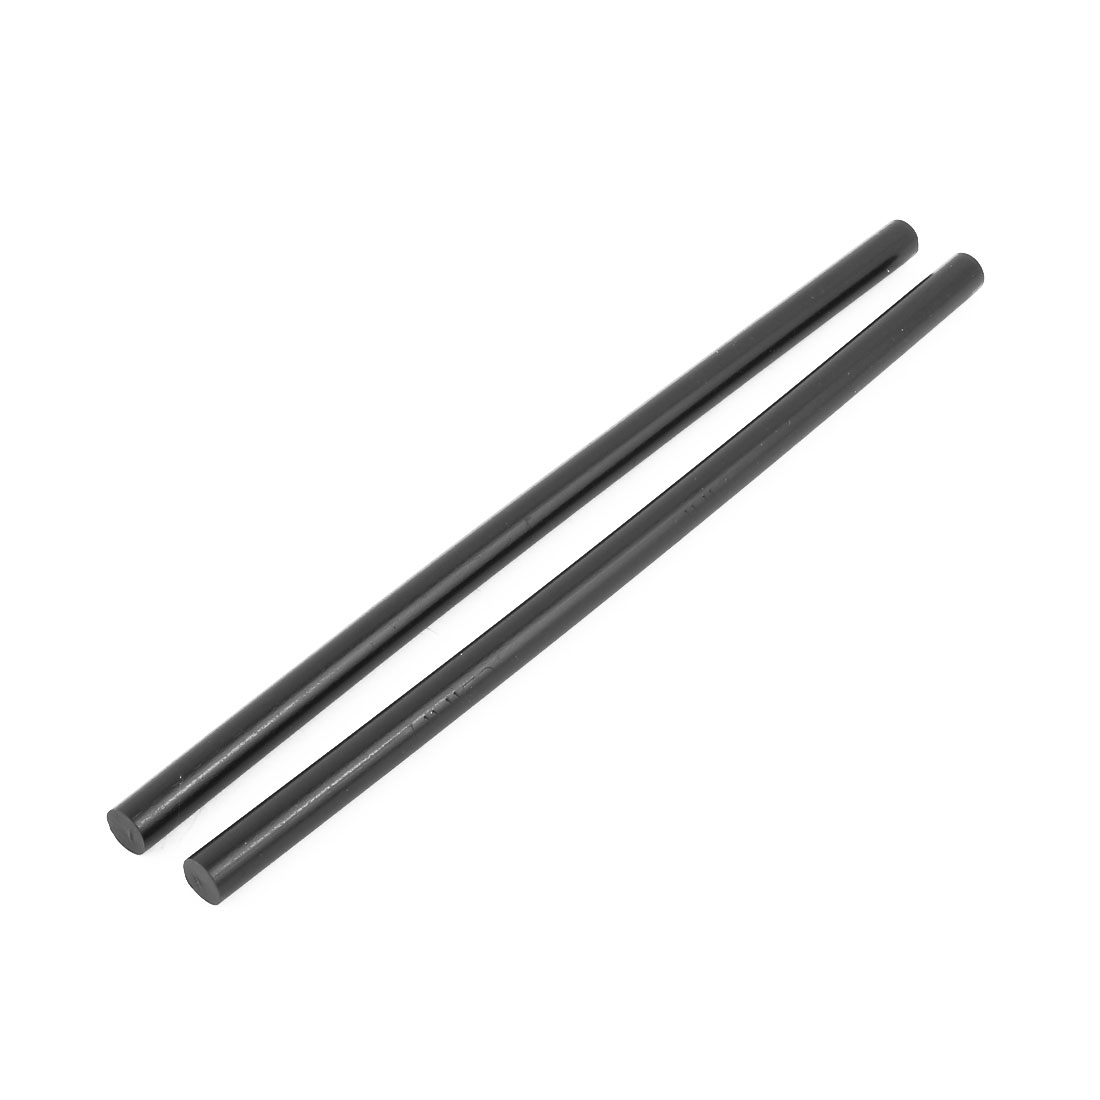 10pcs 11mm x 200mm Black Hot Melt Glue Stick for Electric Tool Hot Melt Glue Gun - image 1 of 3